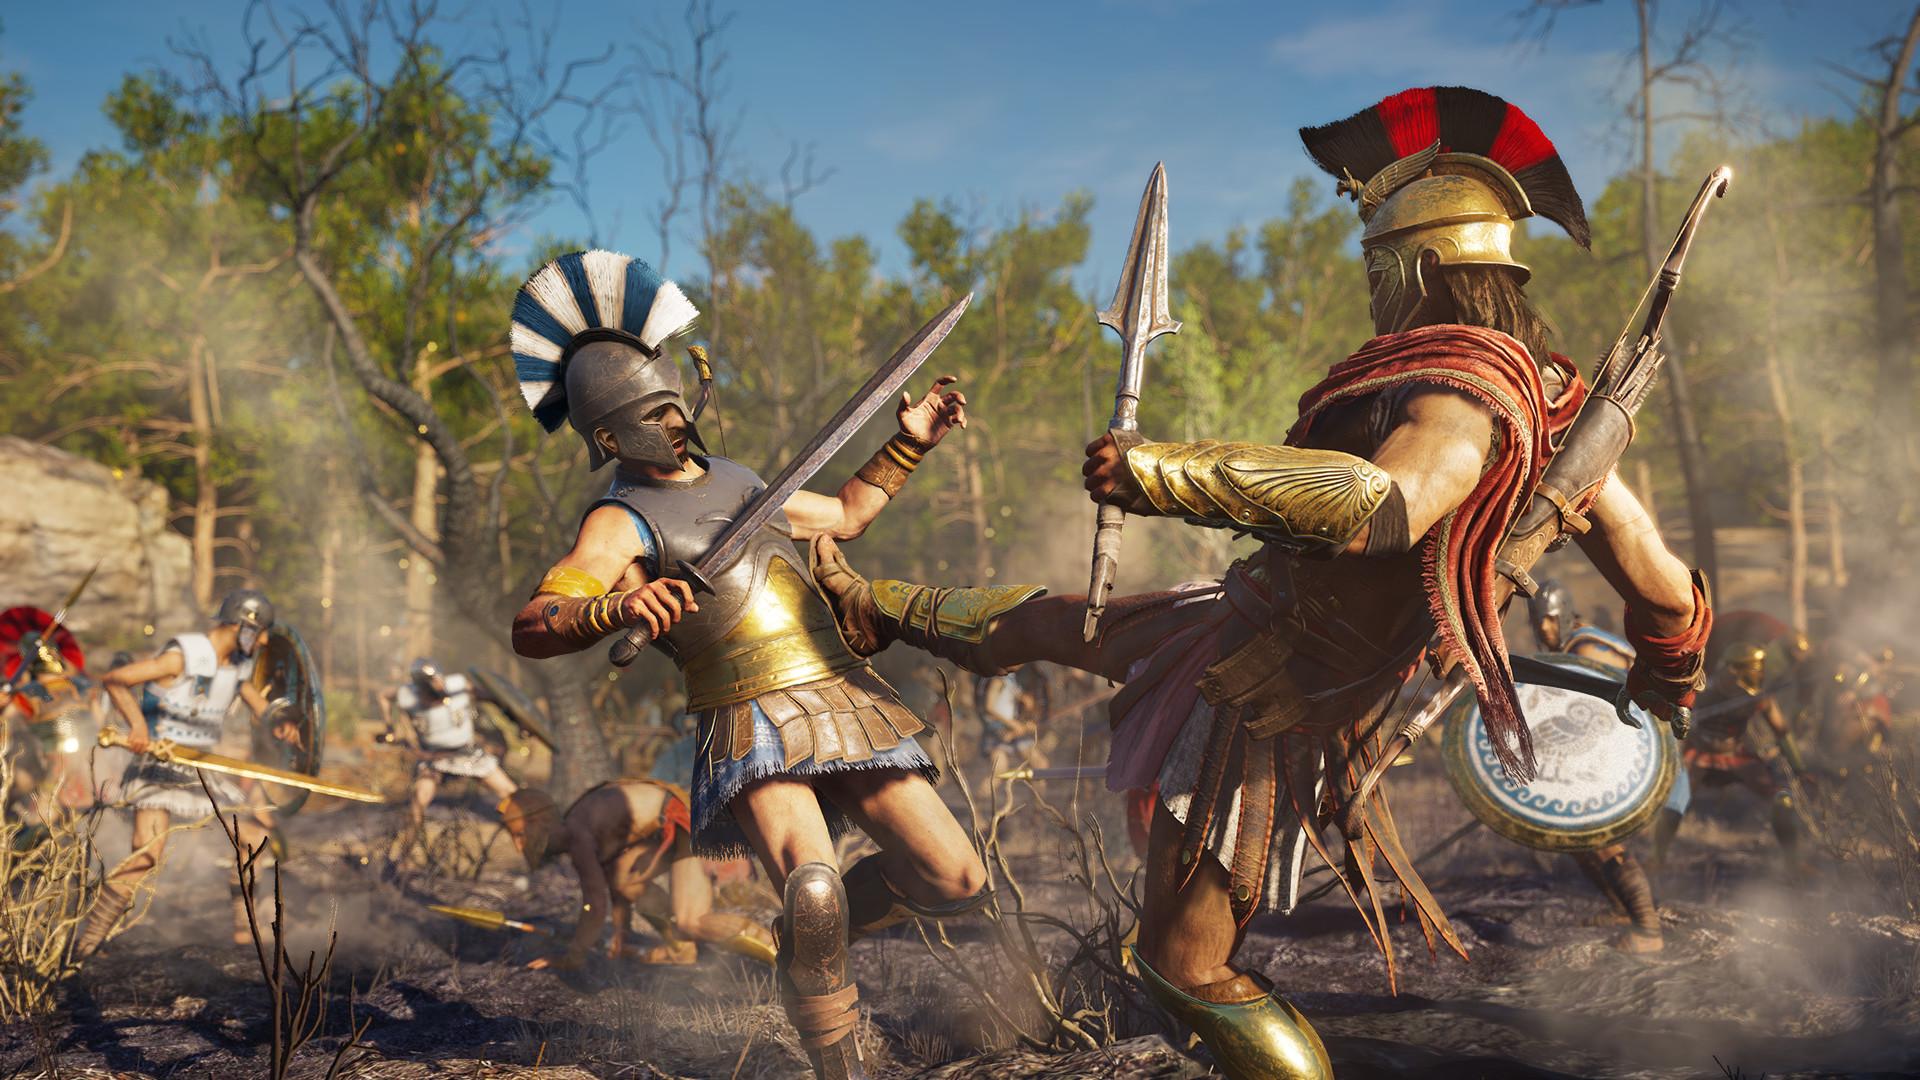 Ubisoft 遊戲訂閱服務「Uplay+」陣容公開,《刺客教條》、《極地戰嚎》、《湯姆克�西》全都沒缺�